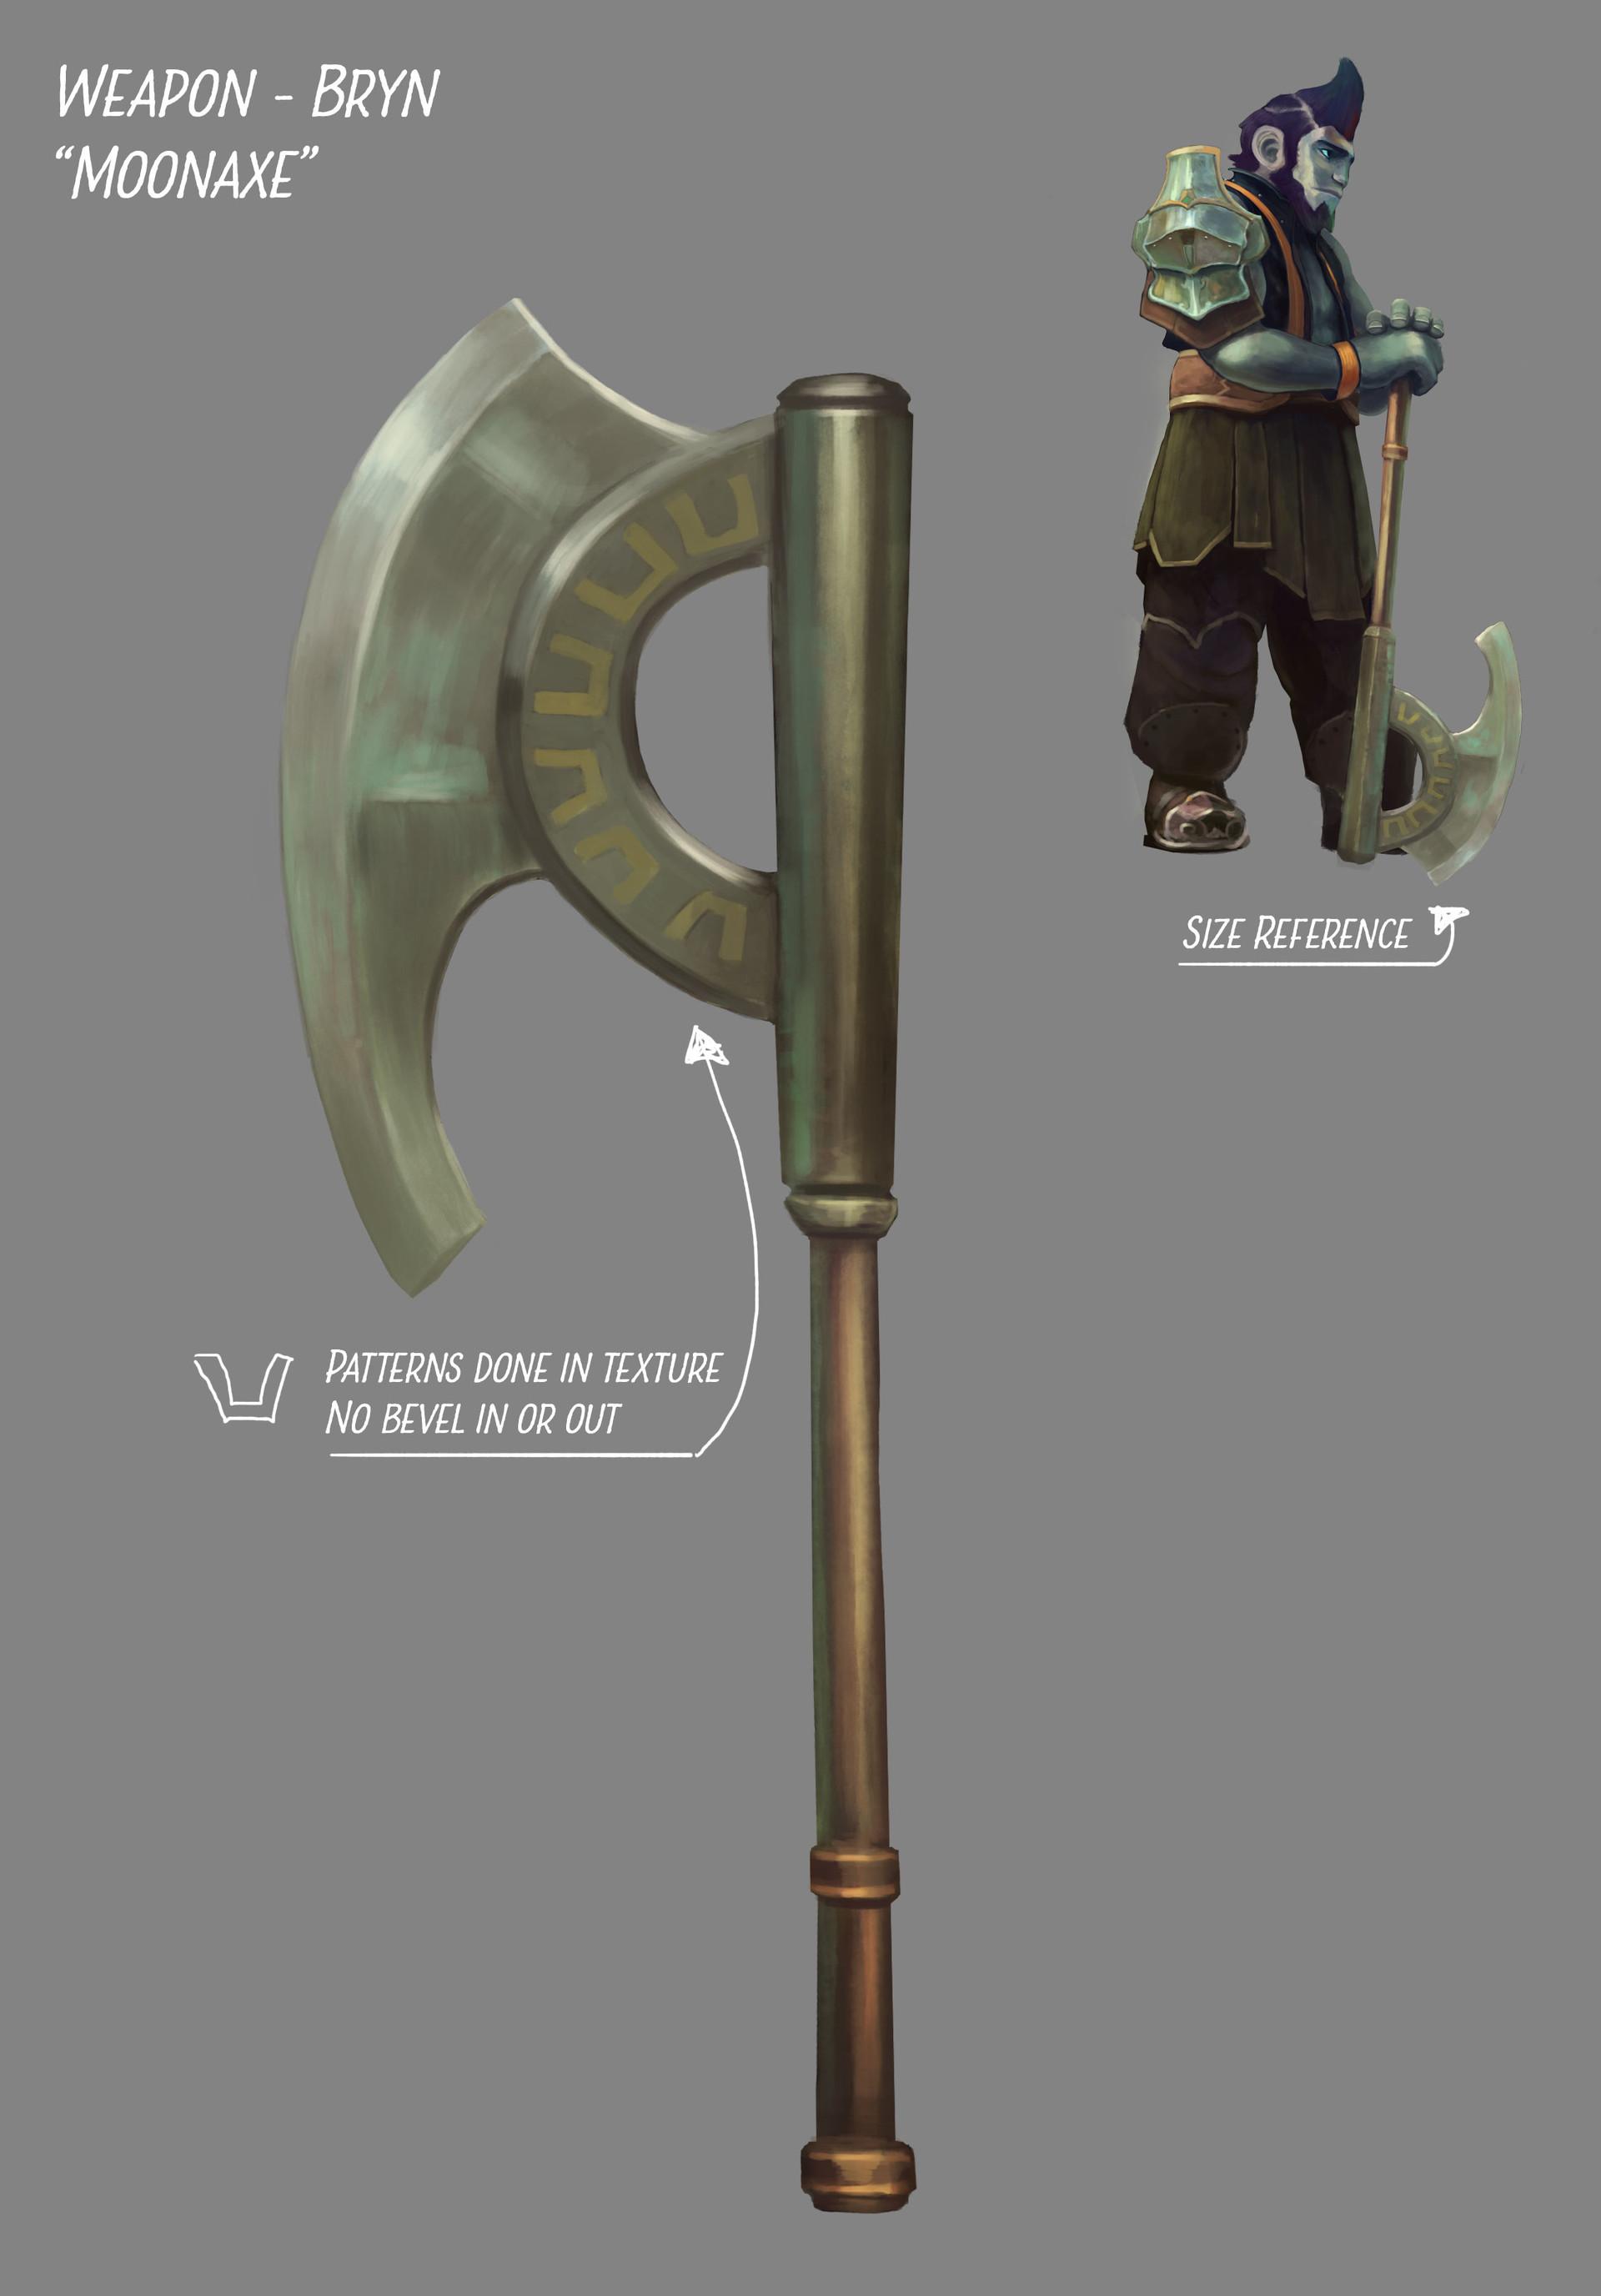 Fredrik dahl conceptart weapon bryn moonaxe